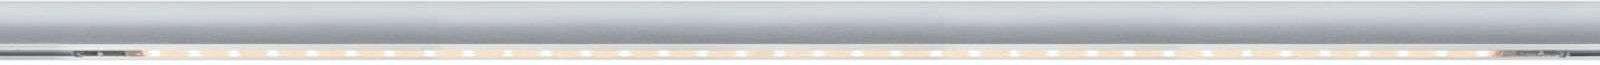 Paulmann URail Inline Ninety track spotlight 90 cm